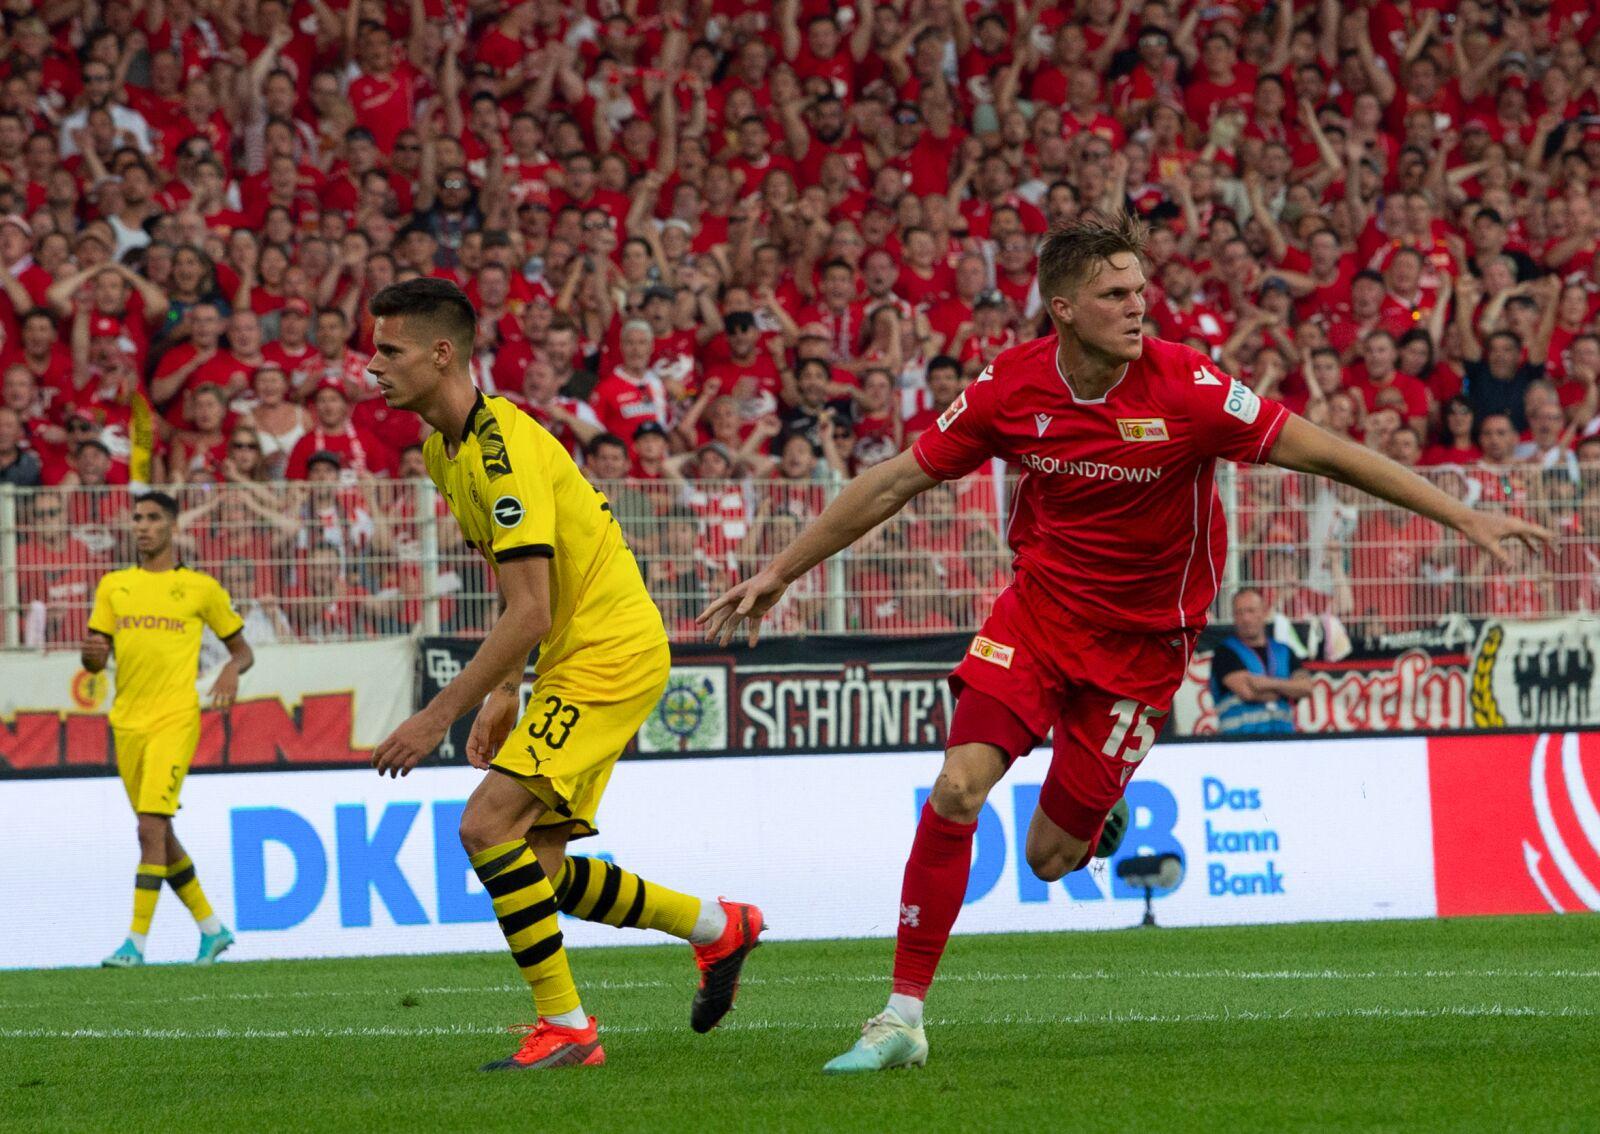 Bundesliga roundup: Bayern, Leipzig run rampant, Borussia Dortmund stumble against Union Berlin